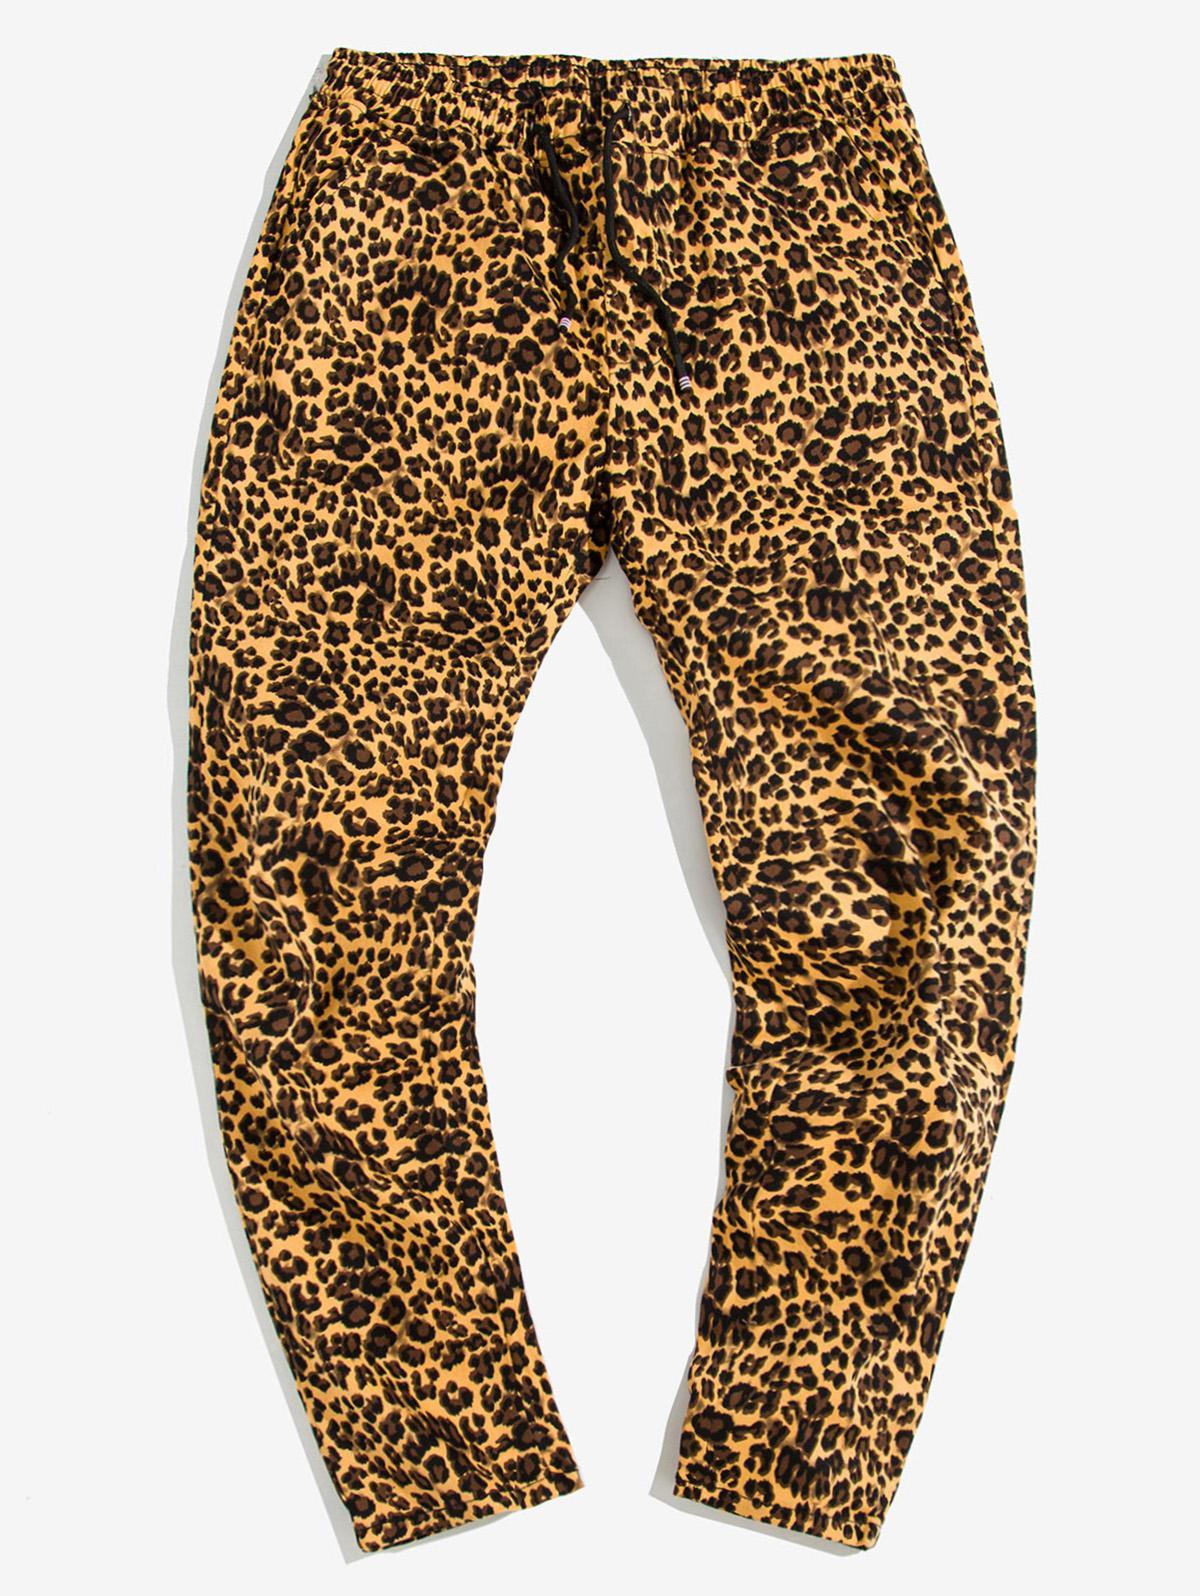 Leopard Print Drawstring Casual Pants фото